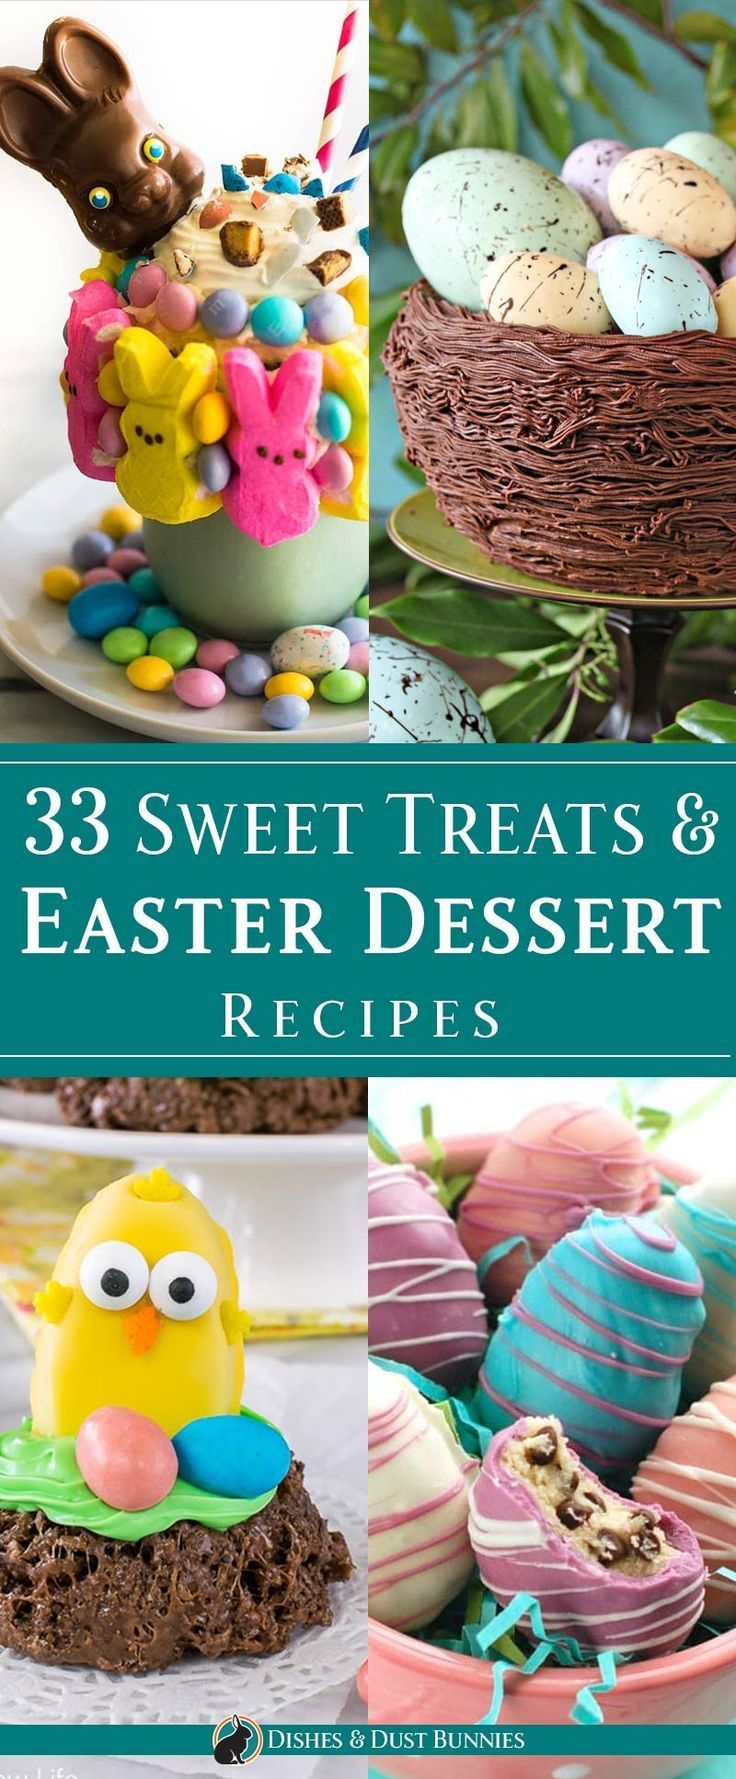 33 Sweet Treats & Easter Dessert Recipes via @mvdustbunnies